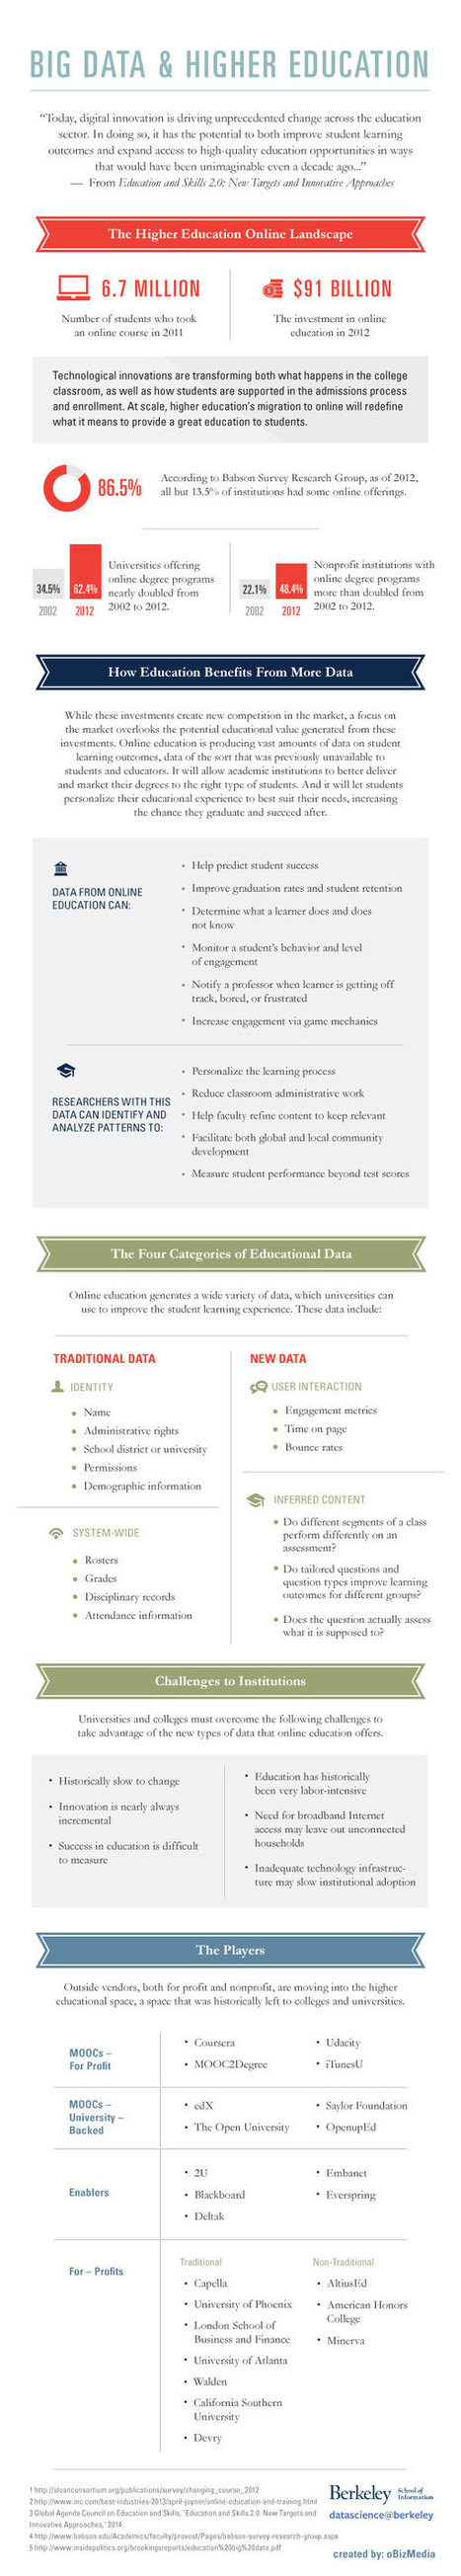 Big Data and Higher Education (Infographic) | Recursos en internet | Scoop.it